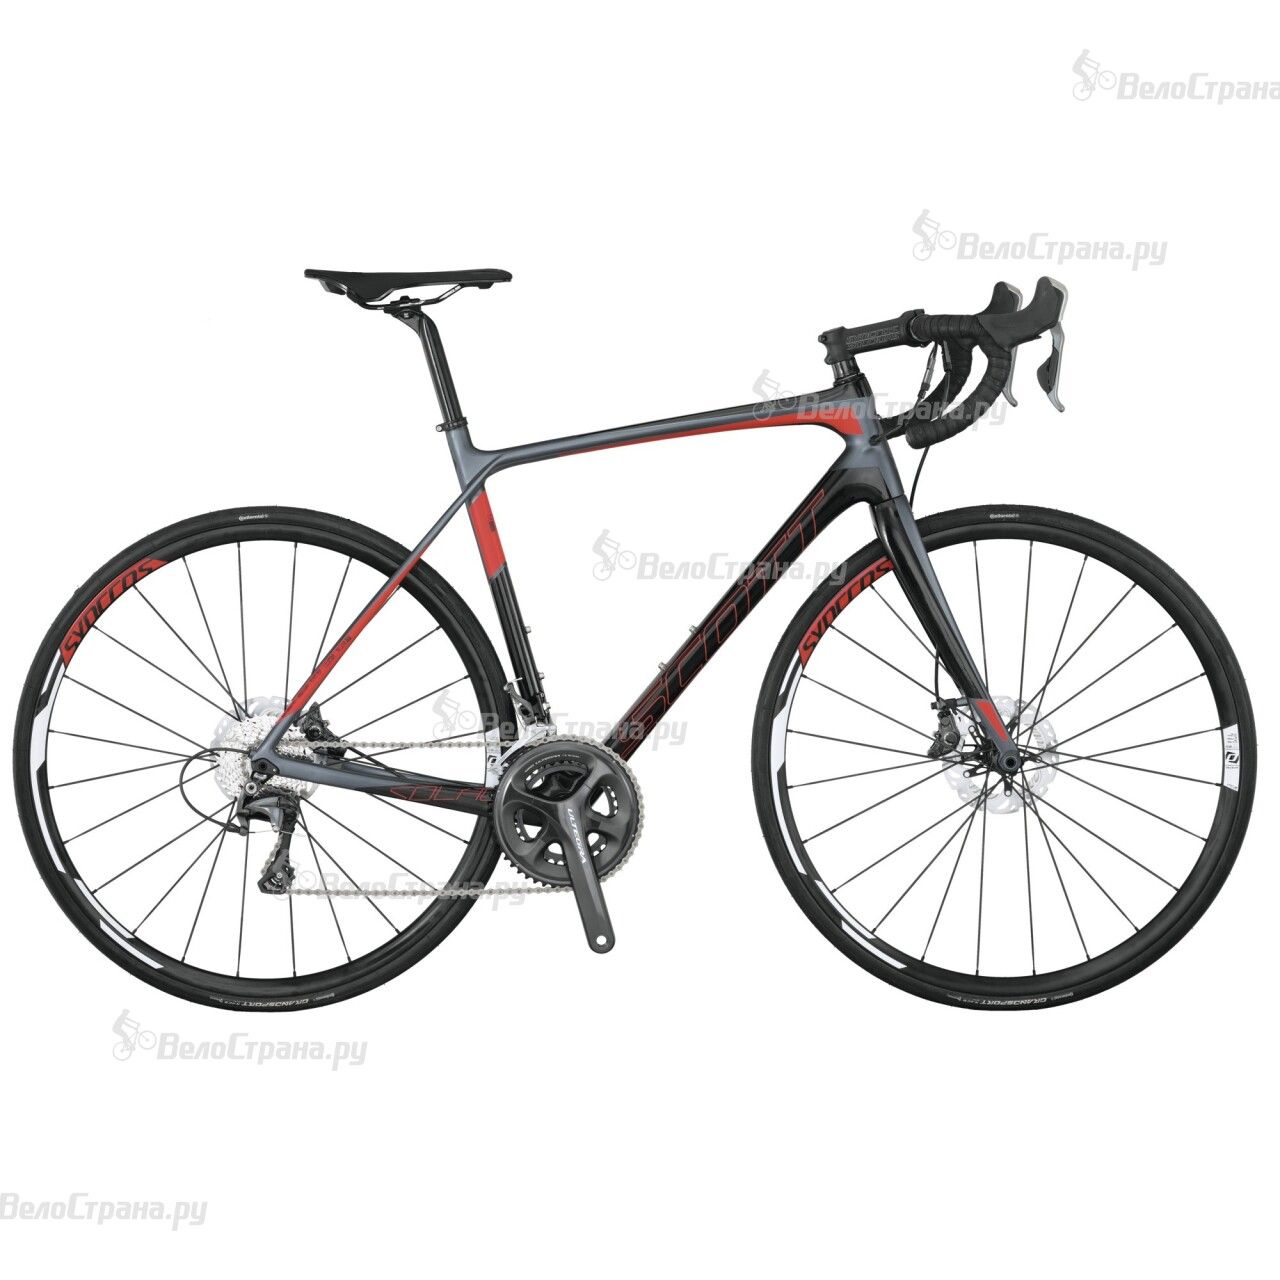 Велосипед Scott Solace 15 Disc (2015) велосипед scott contessa solace 15 compact 2015